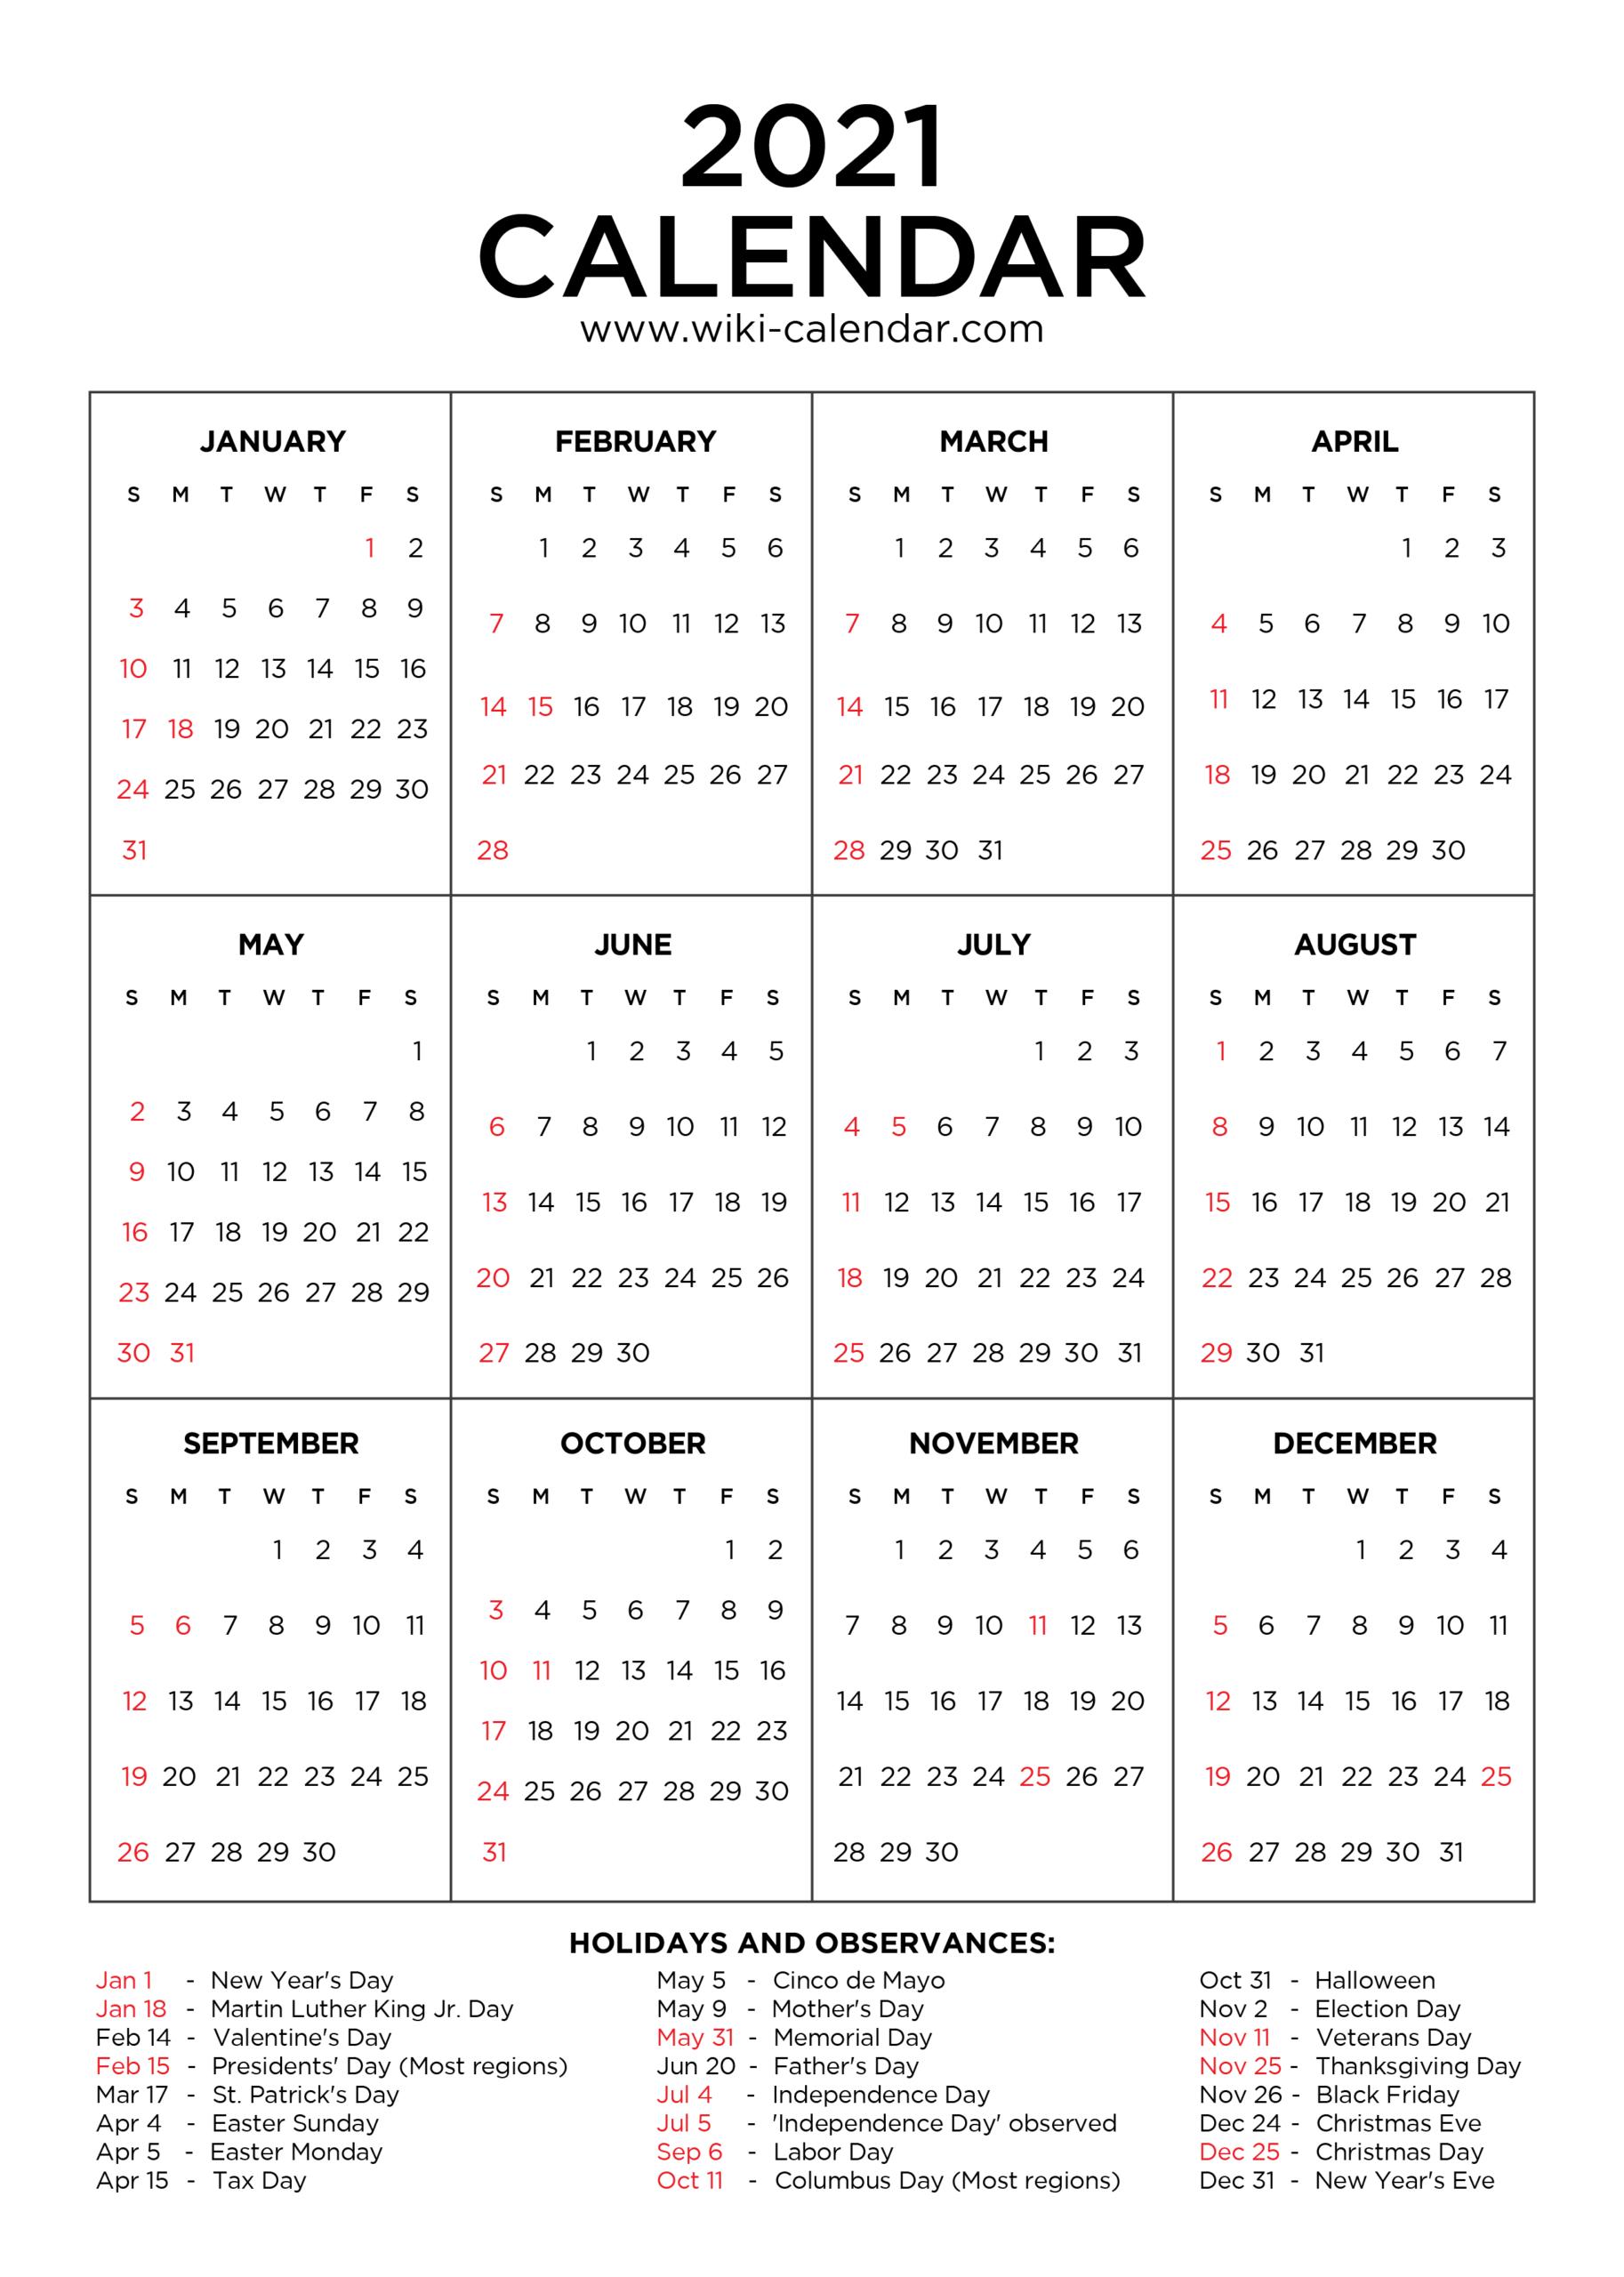 Free Printable 2021 Calendar With Holidays January Through December